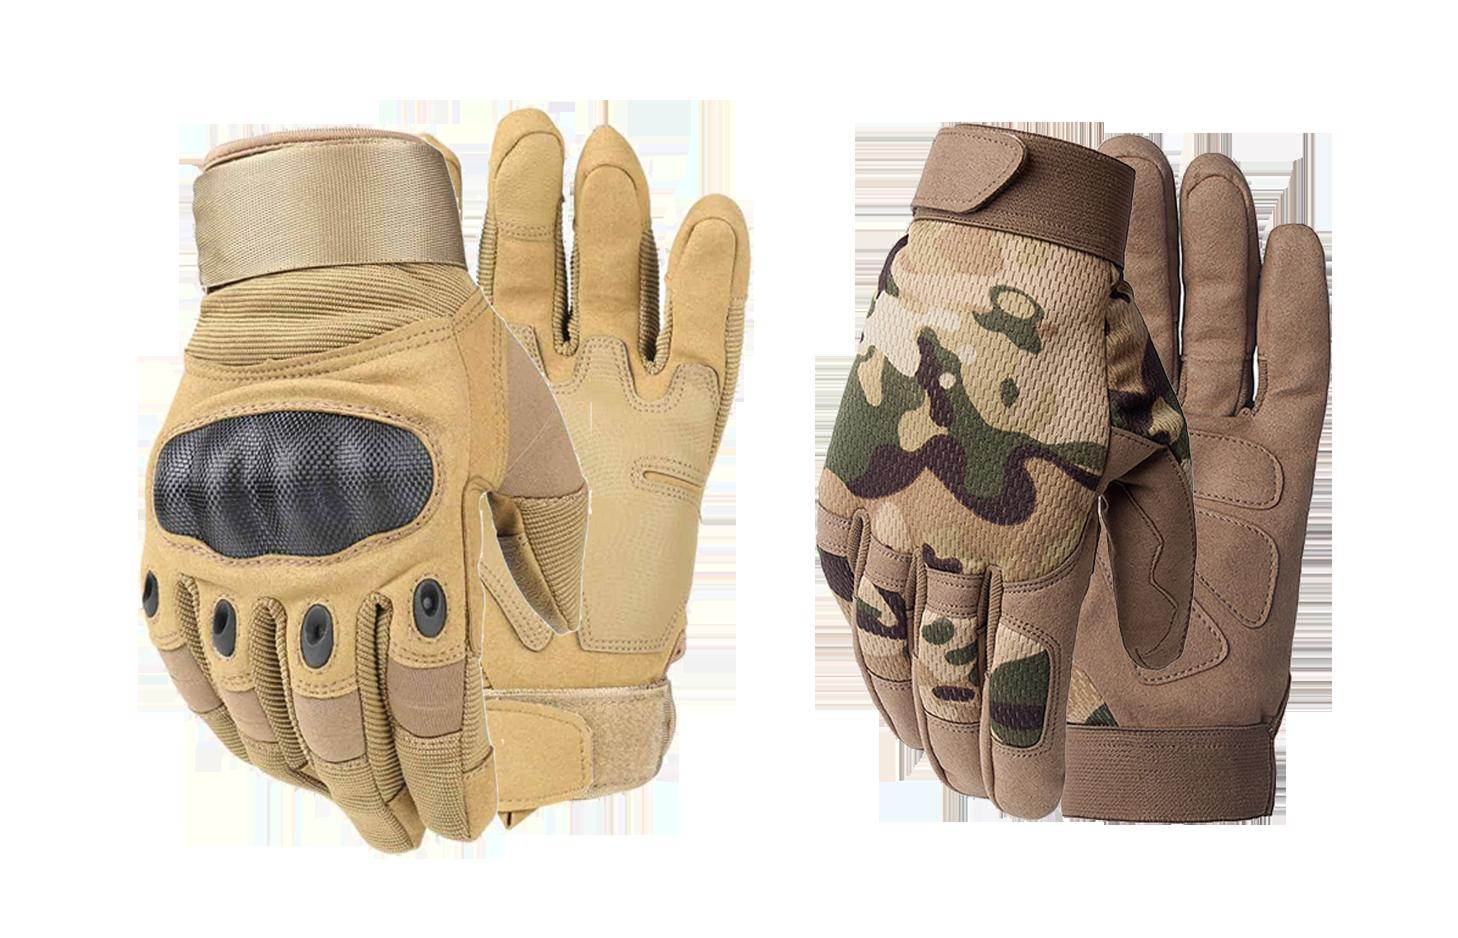 military tactical gloves at bereli